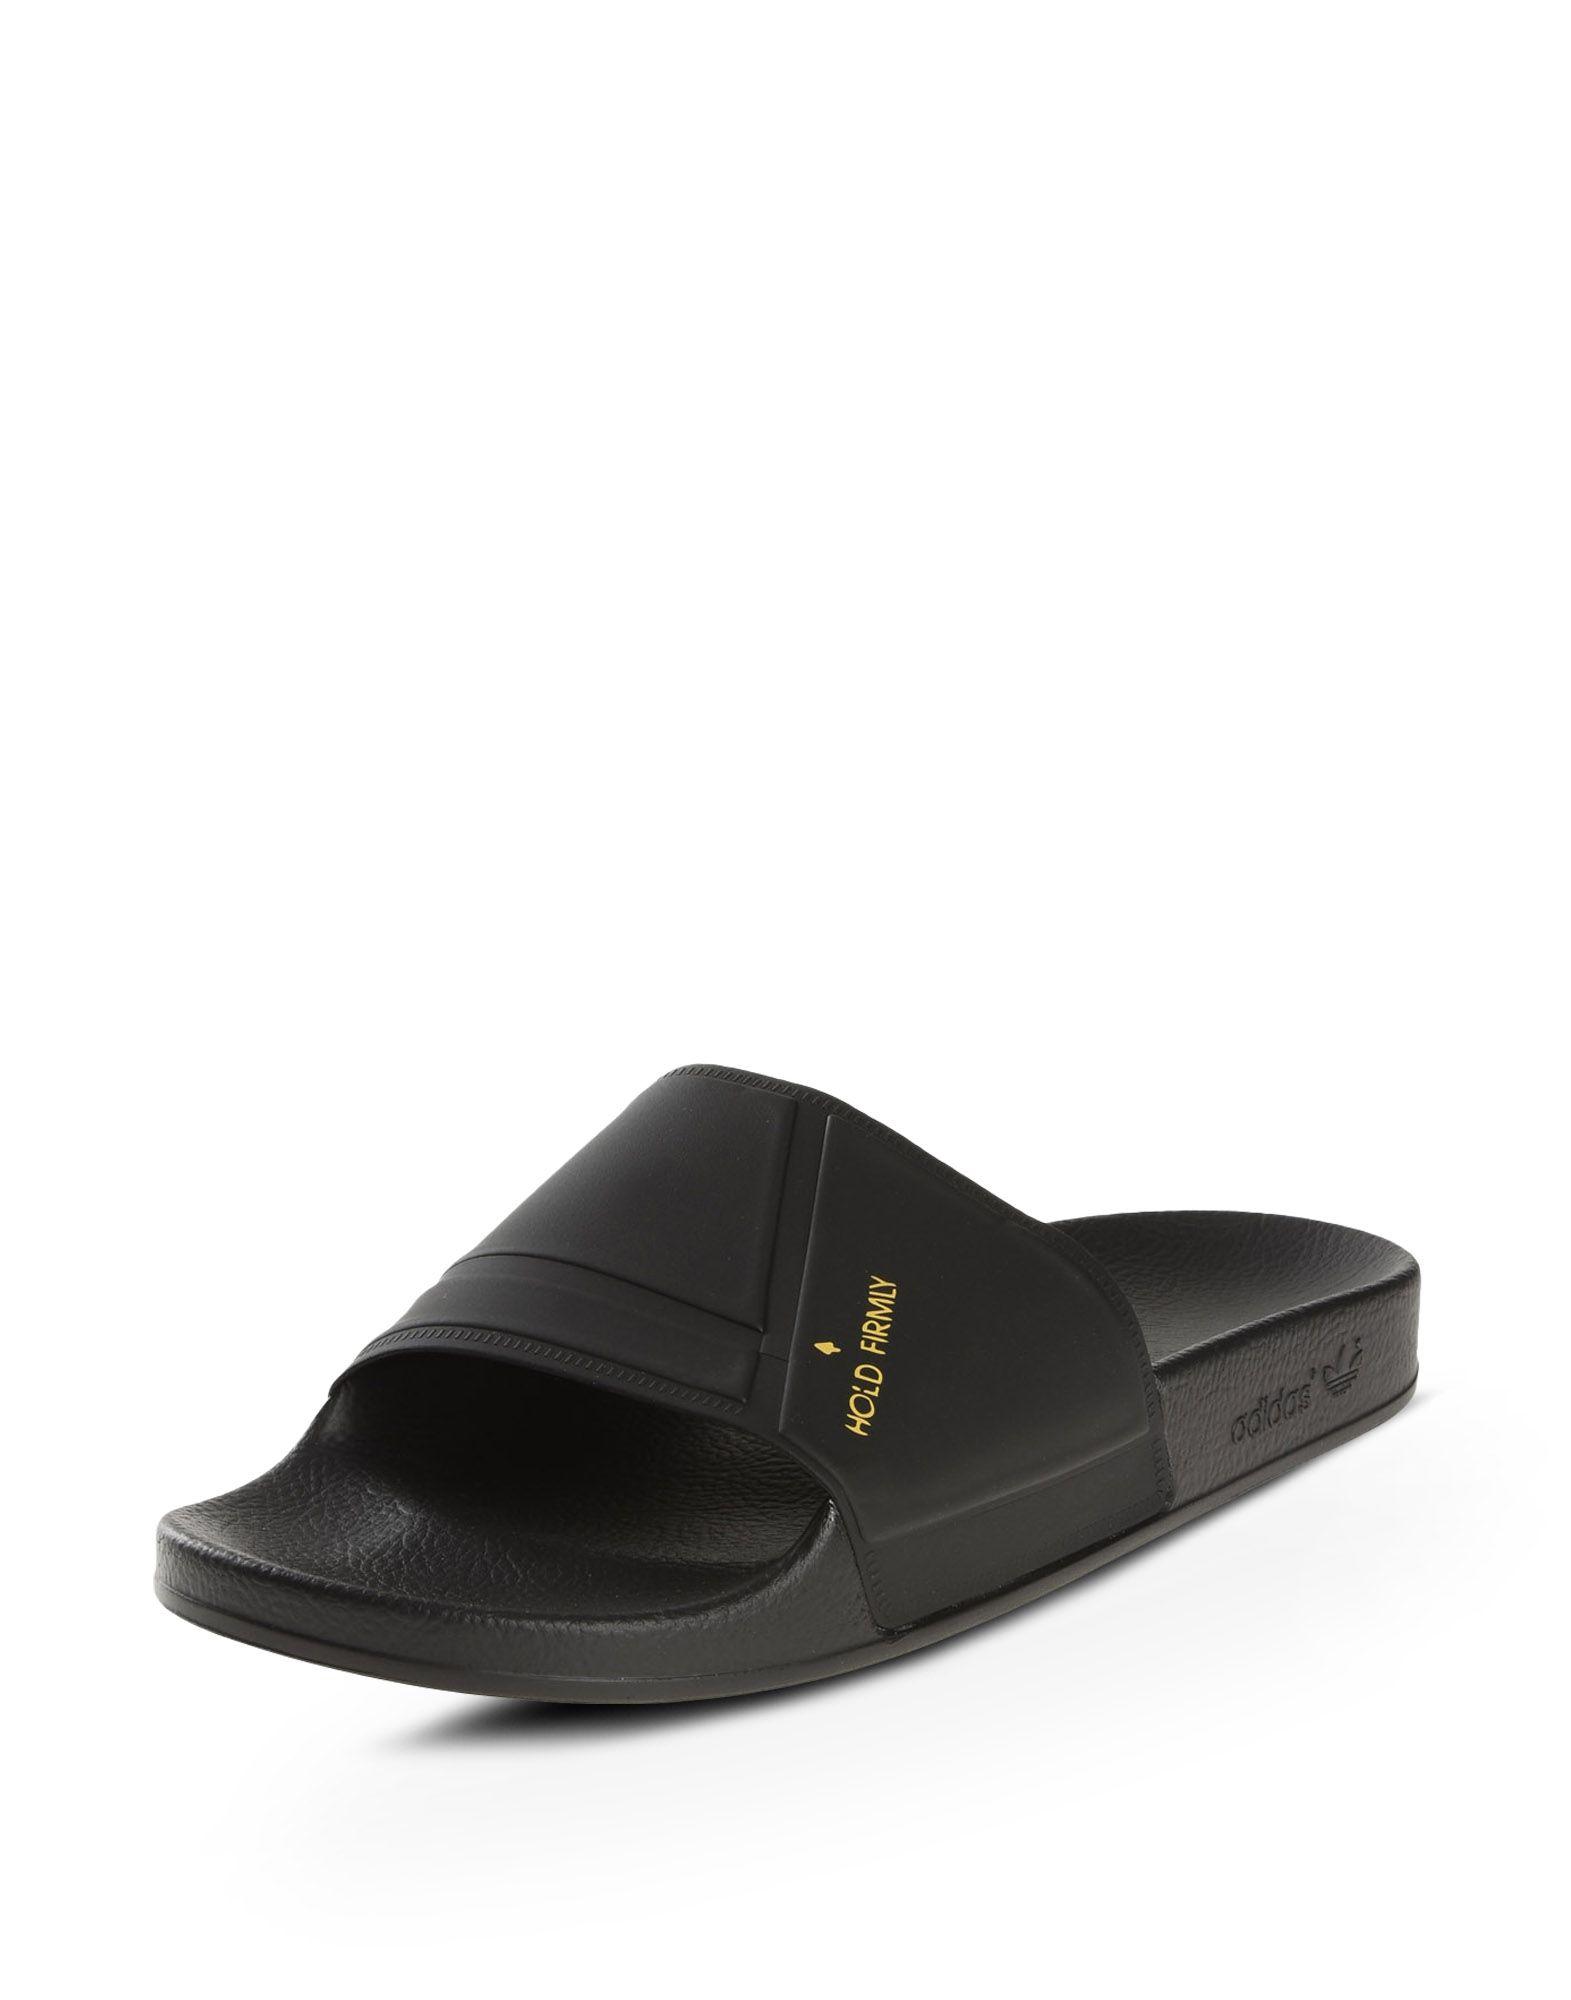 women's adidas adilette sandals